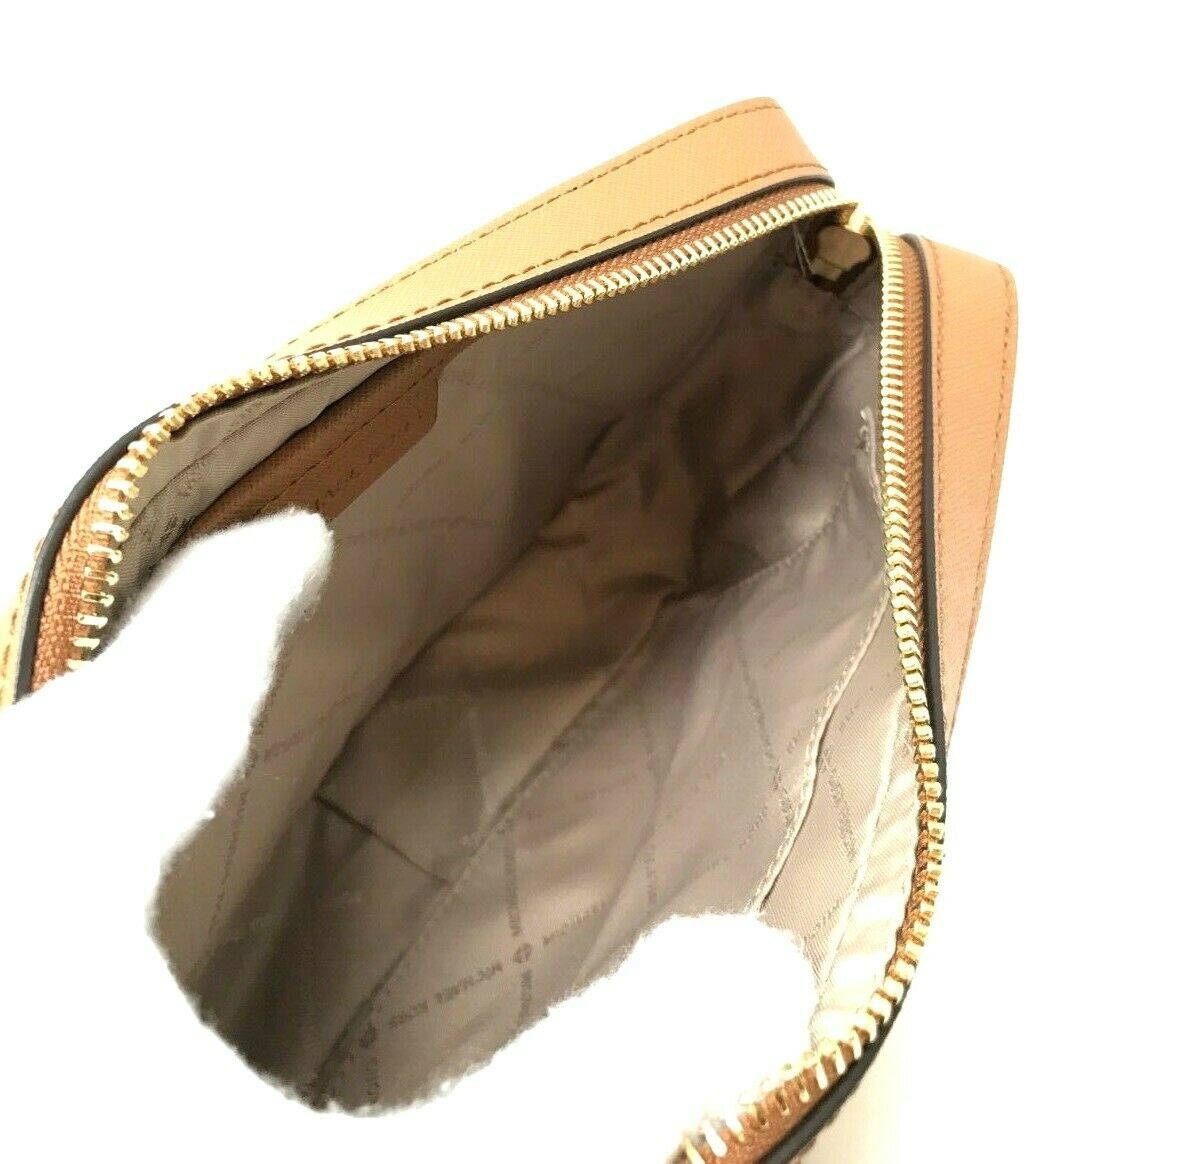 thumbnail 79 - Michael Kors Jet Set Item Large East West Crossbody Chain Handbag Clutch $298